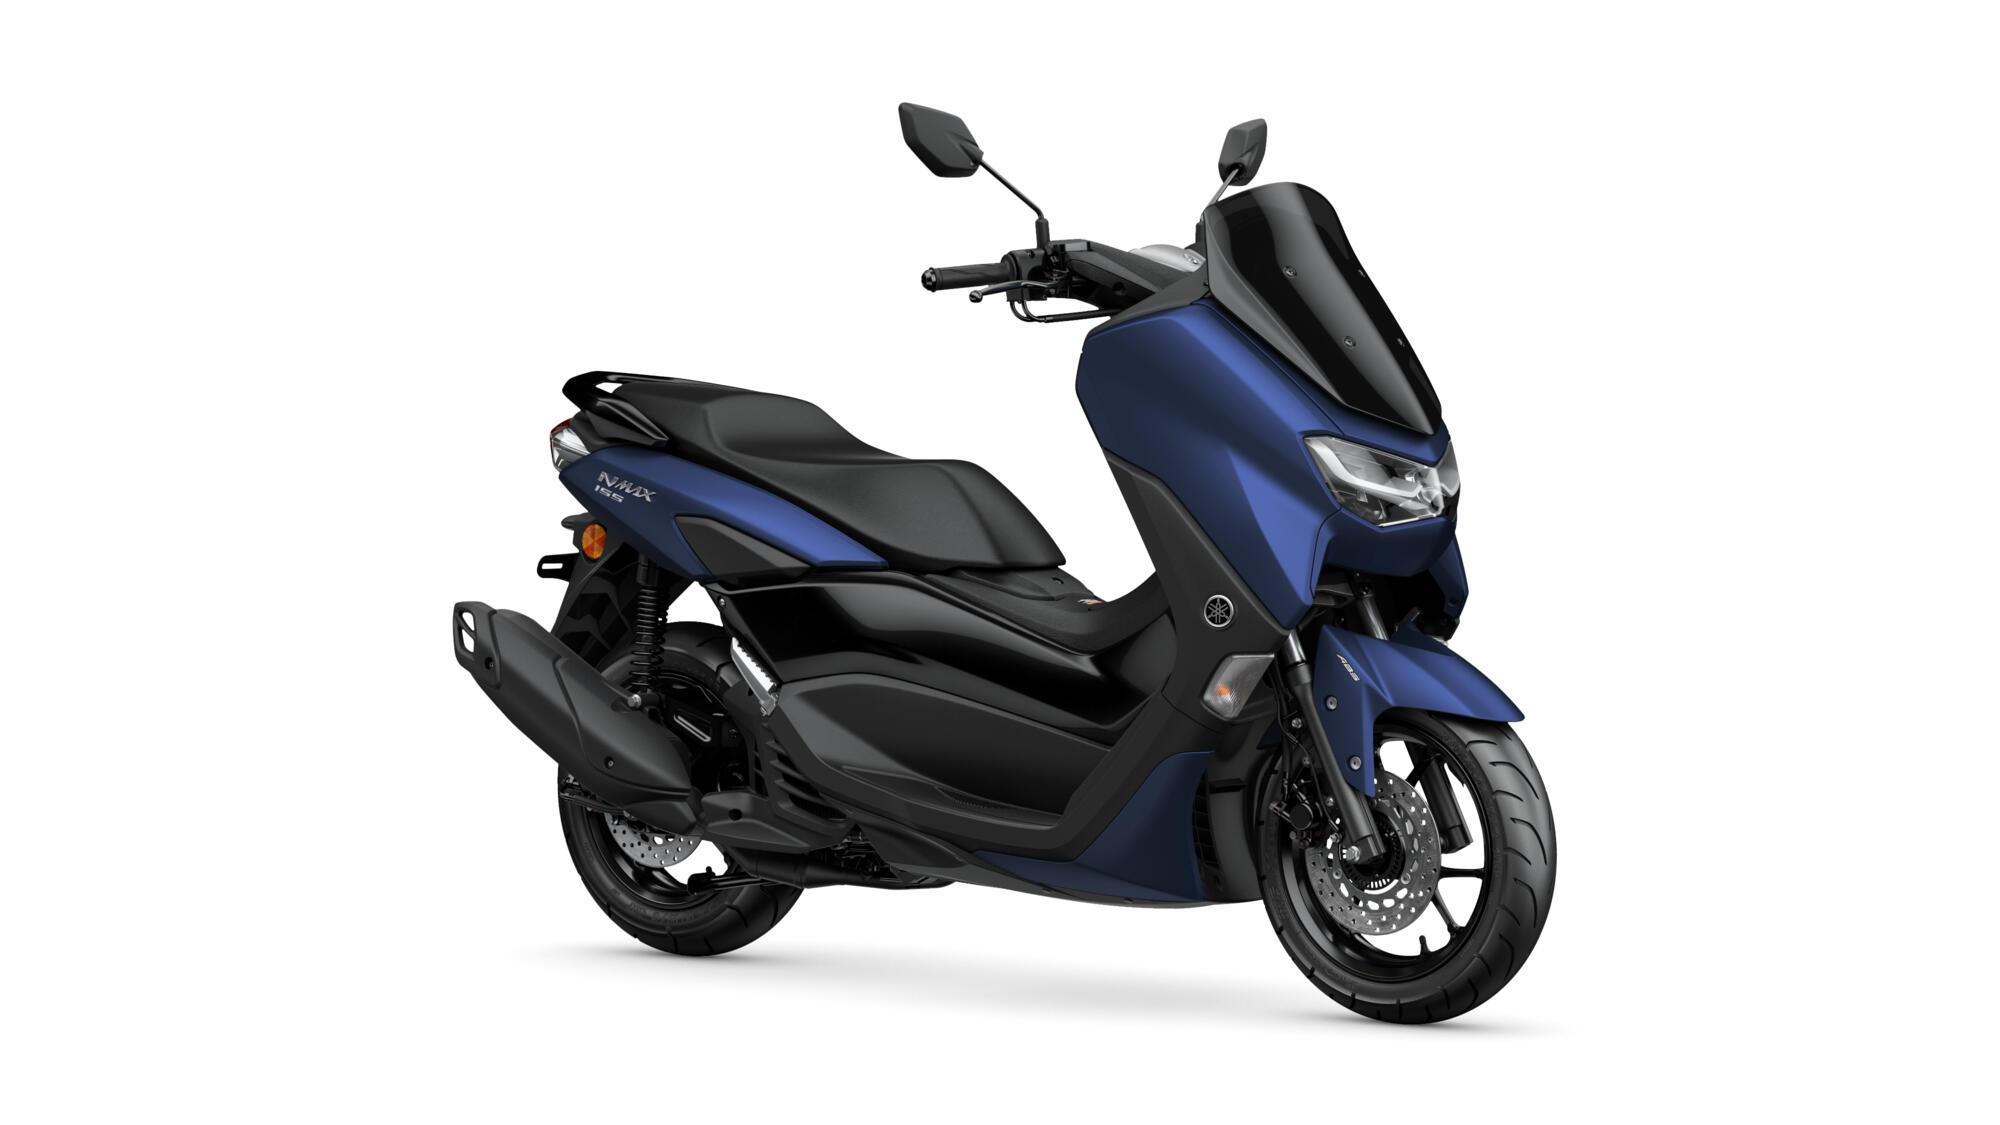 NMAX 155 - scooters - Yamaha Motor